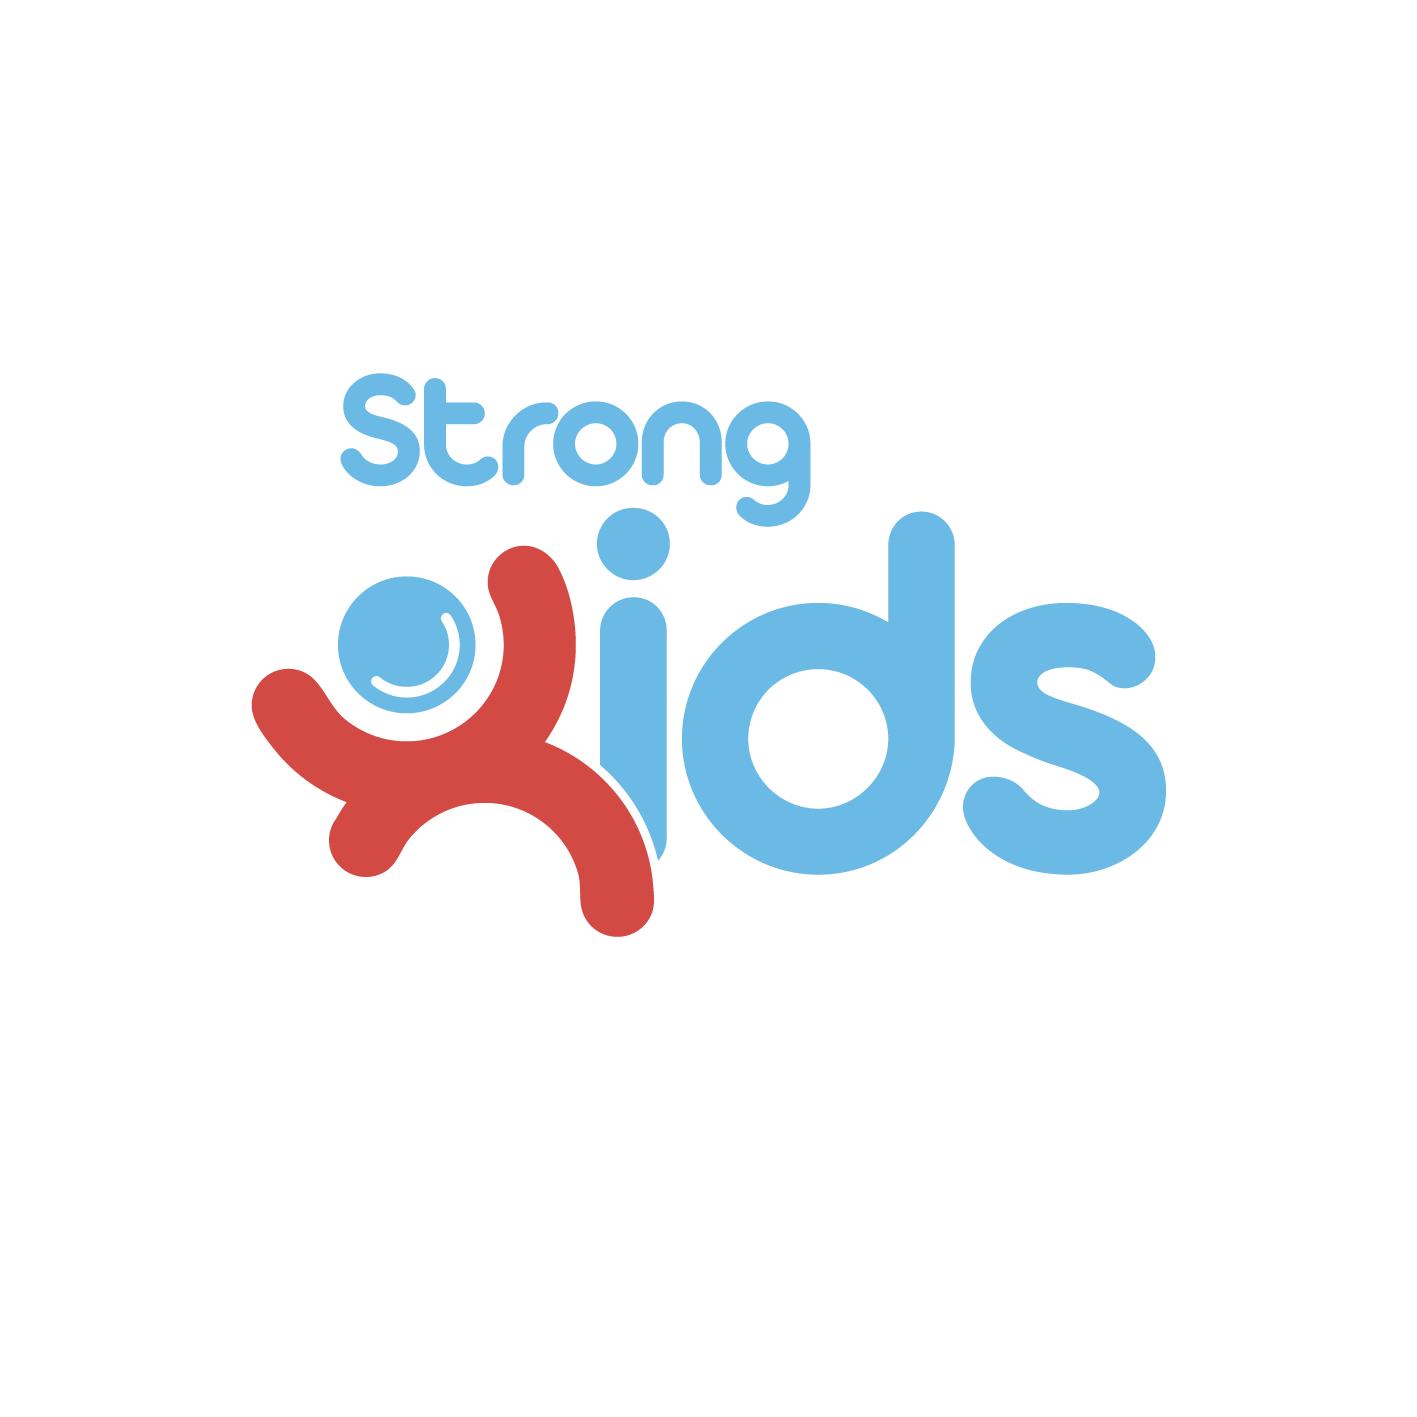 Логотип для Детского Интернет Магазина StrongKids фото f_4655c7477f32ebc2.png